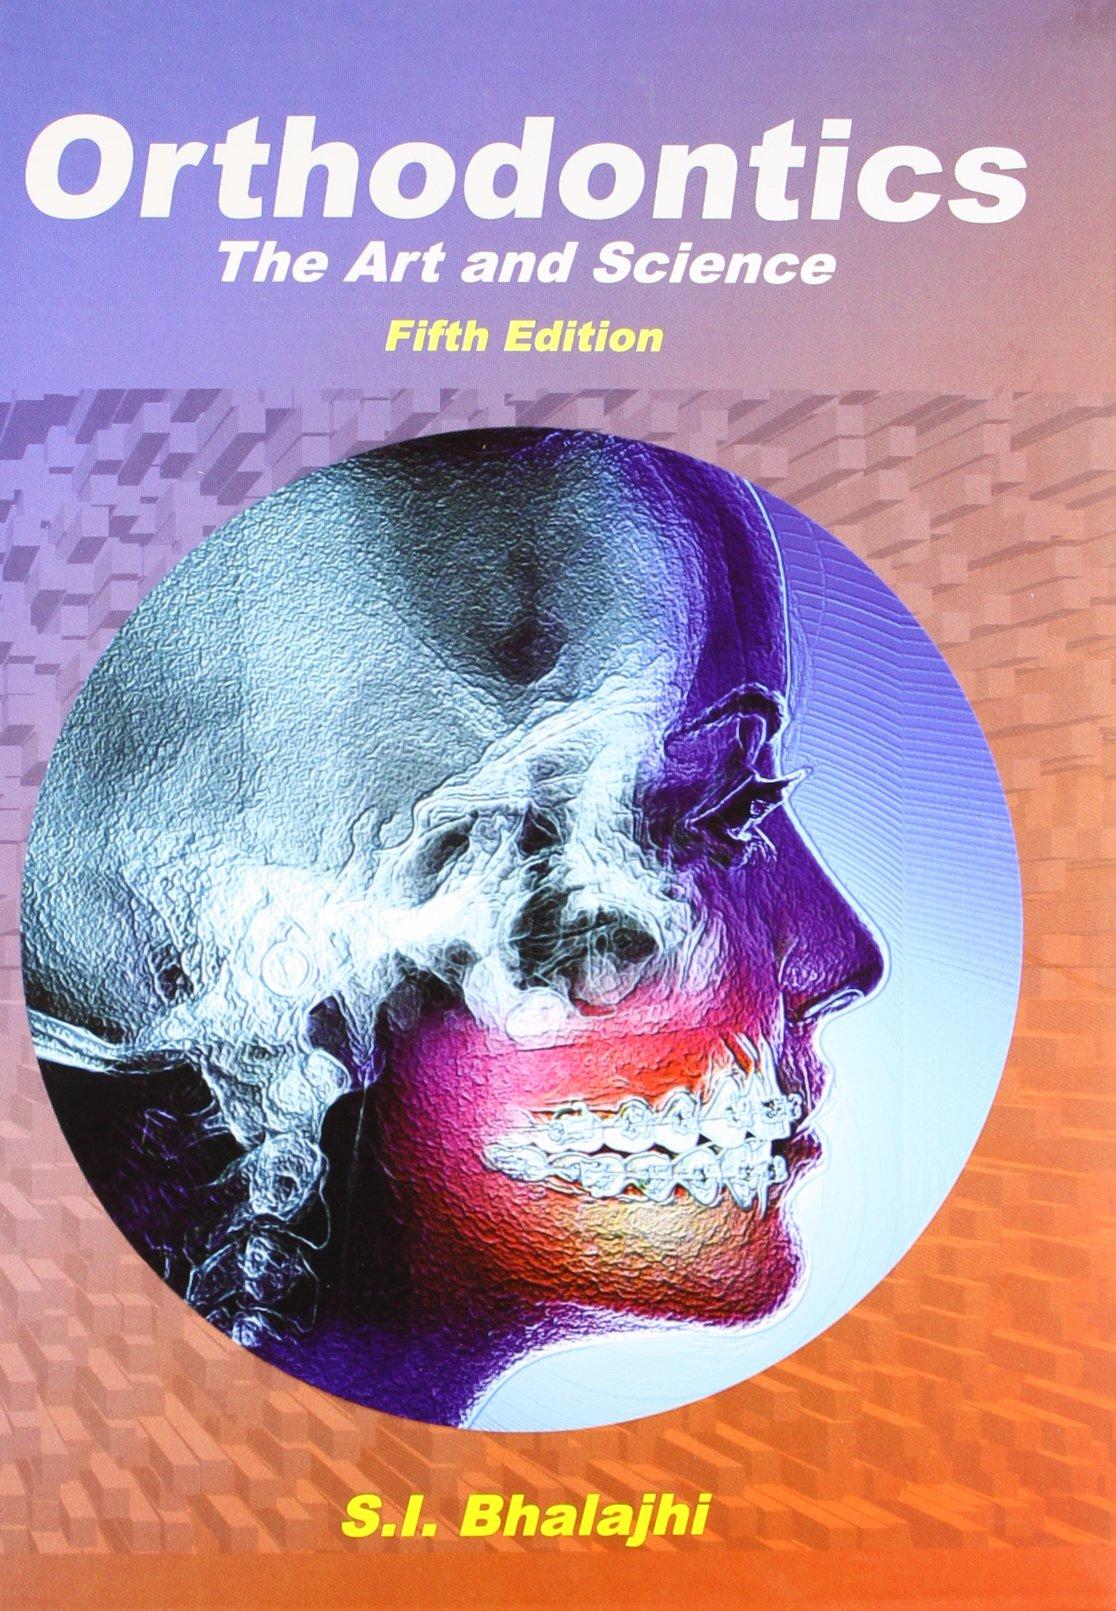 Download contemporary orthodontics, 4e ebook pdf szjxqrozfl vikdjeas.